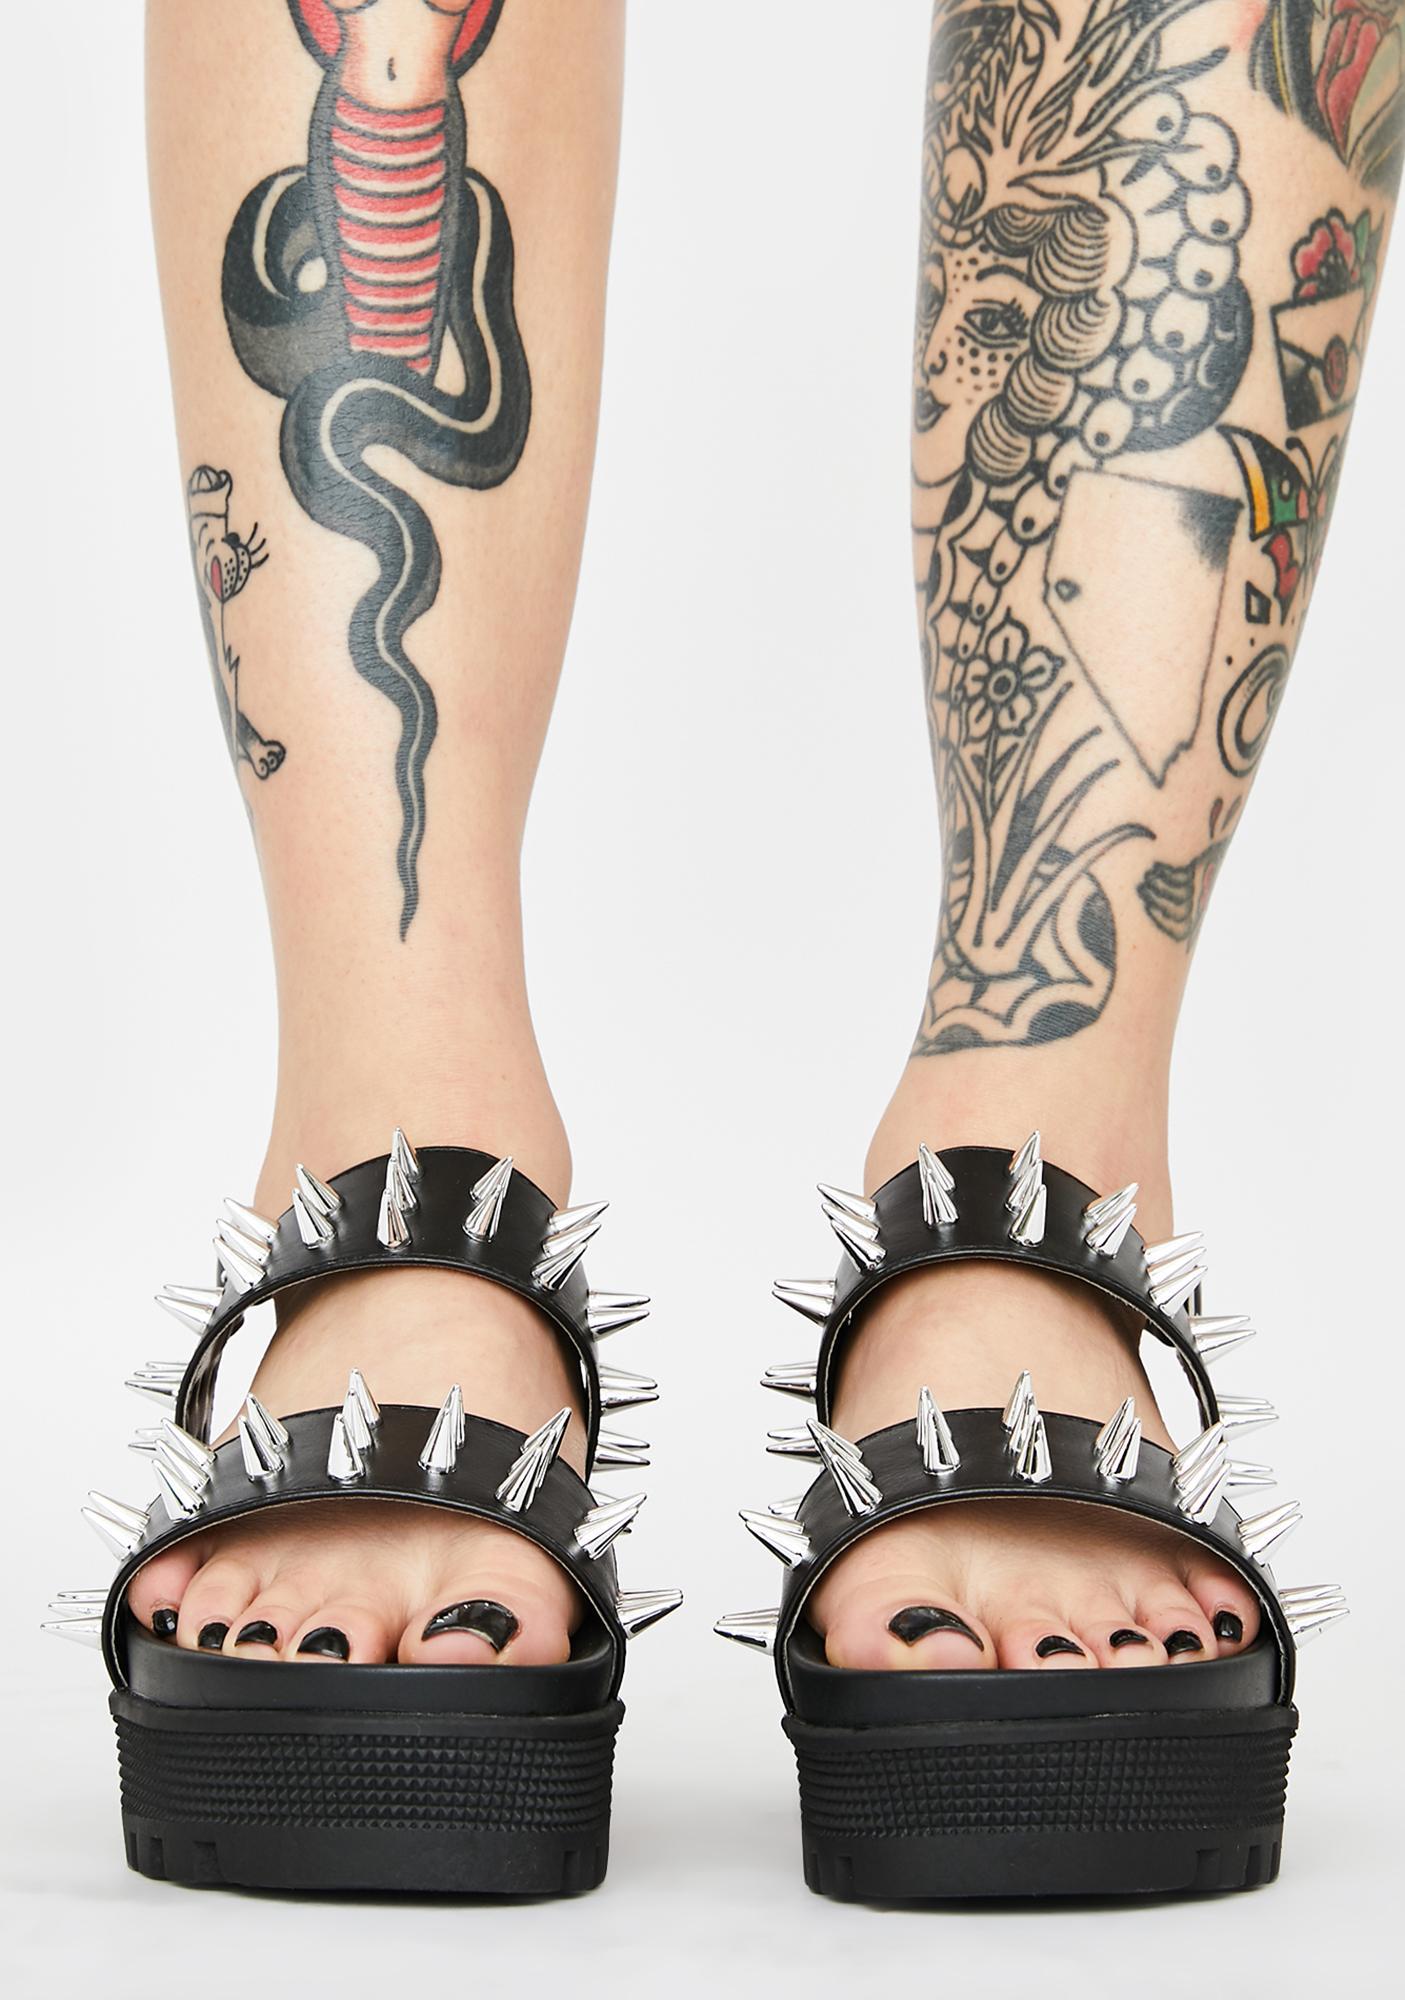 Total Annihilation Spiked Sandals